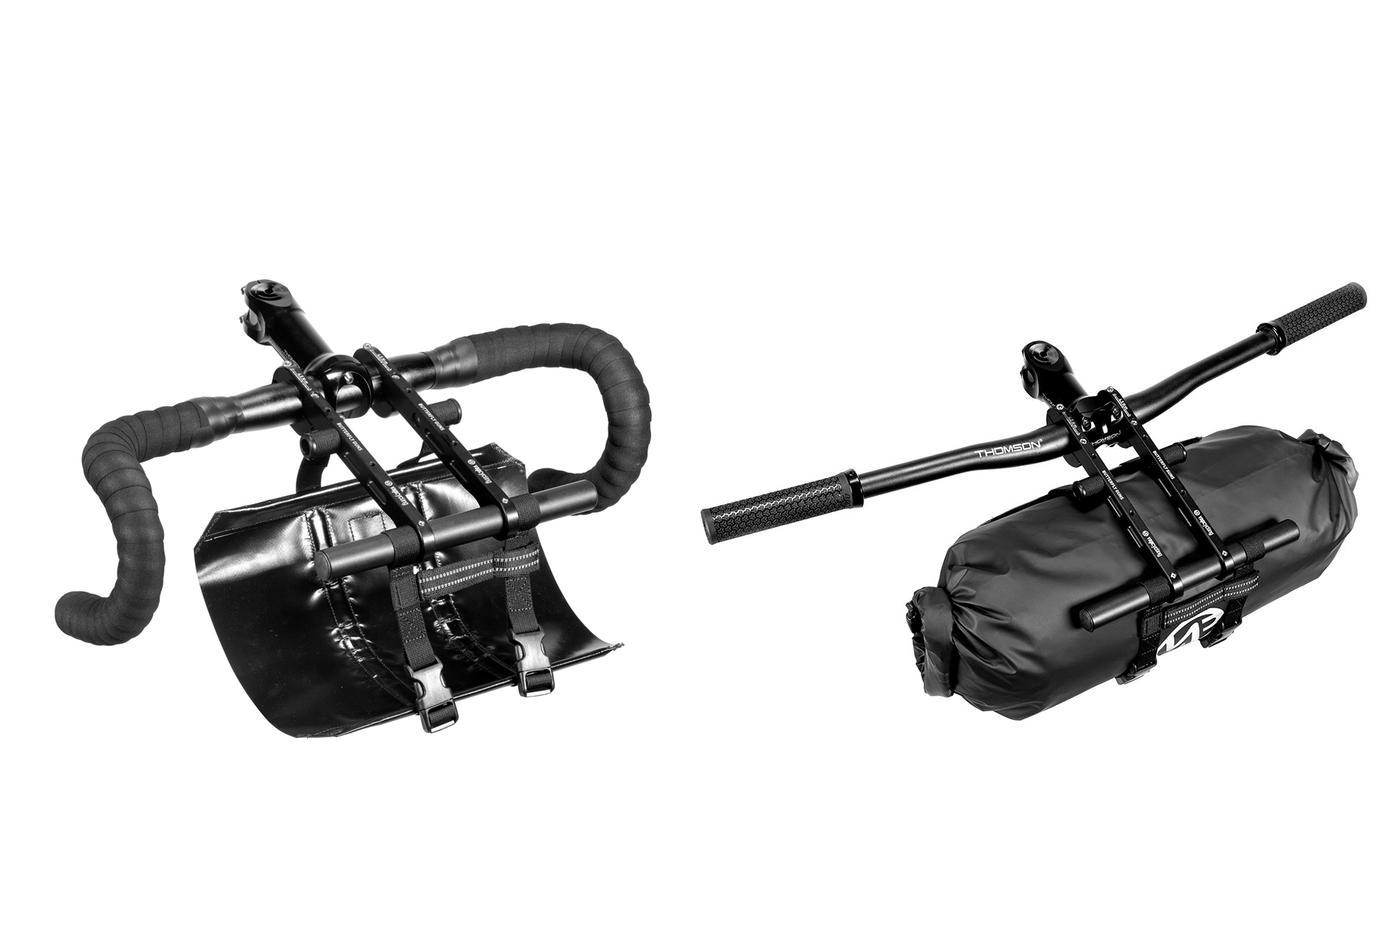 Vapcycling's Unique Butterfly Guns Handlebar Bikepacking Bag Harness